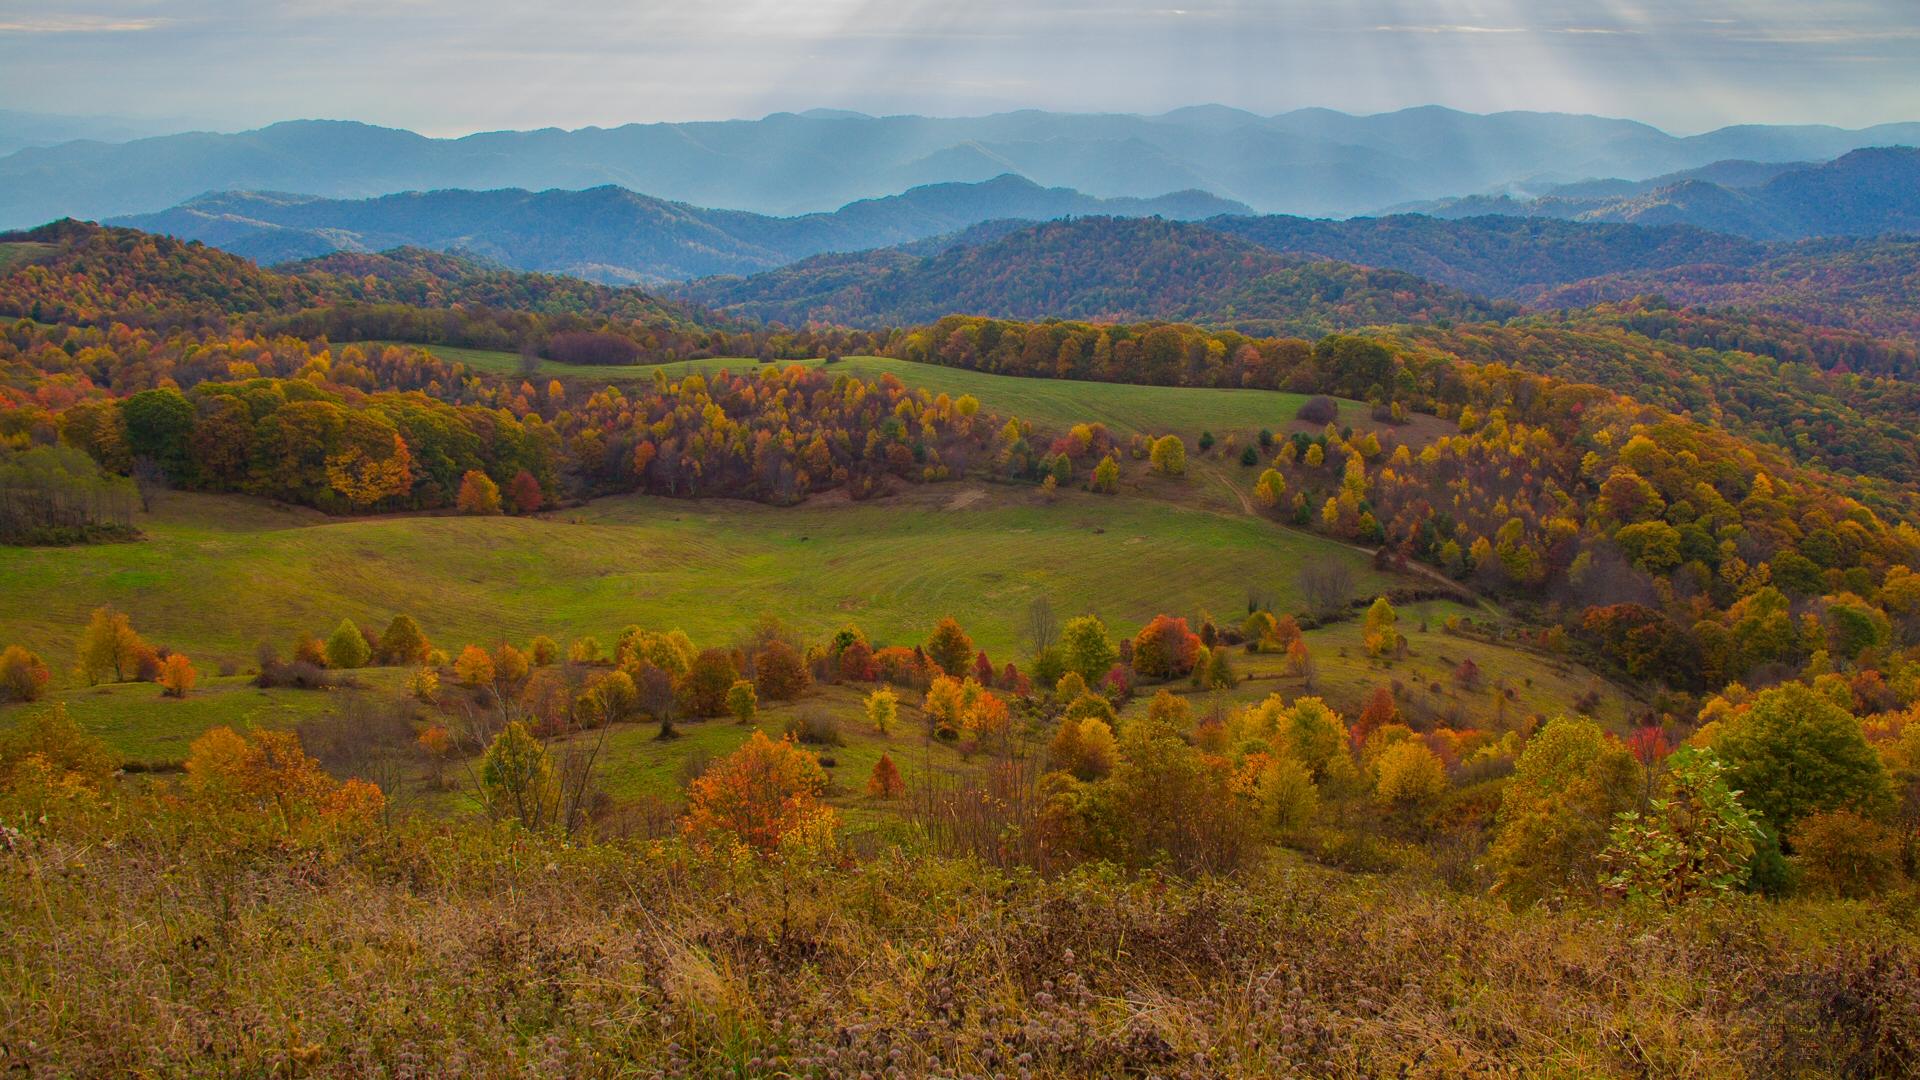 Buckeye Ridge from Max Patch on the Appalachian Trail - Photo by Jeff Clark